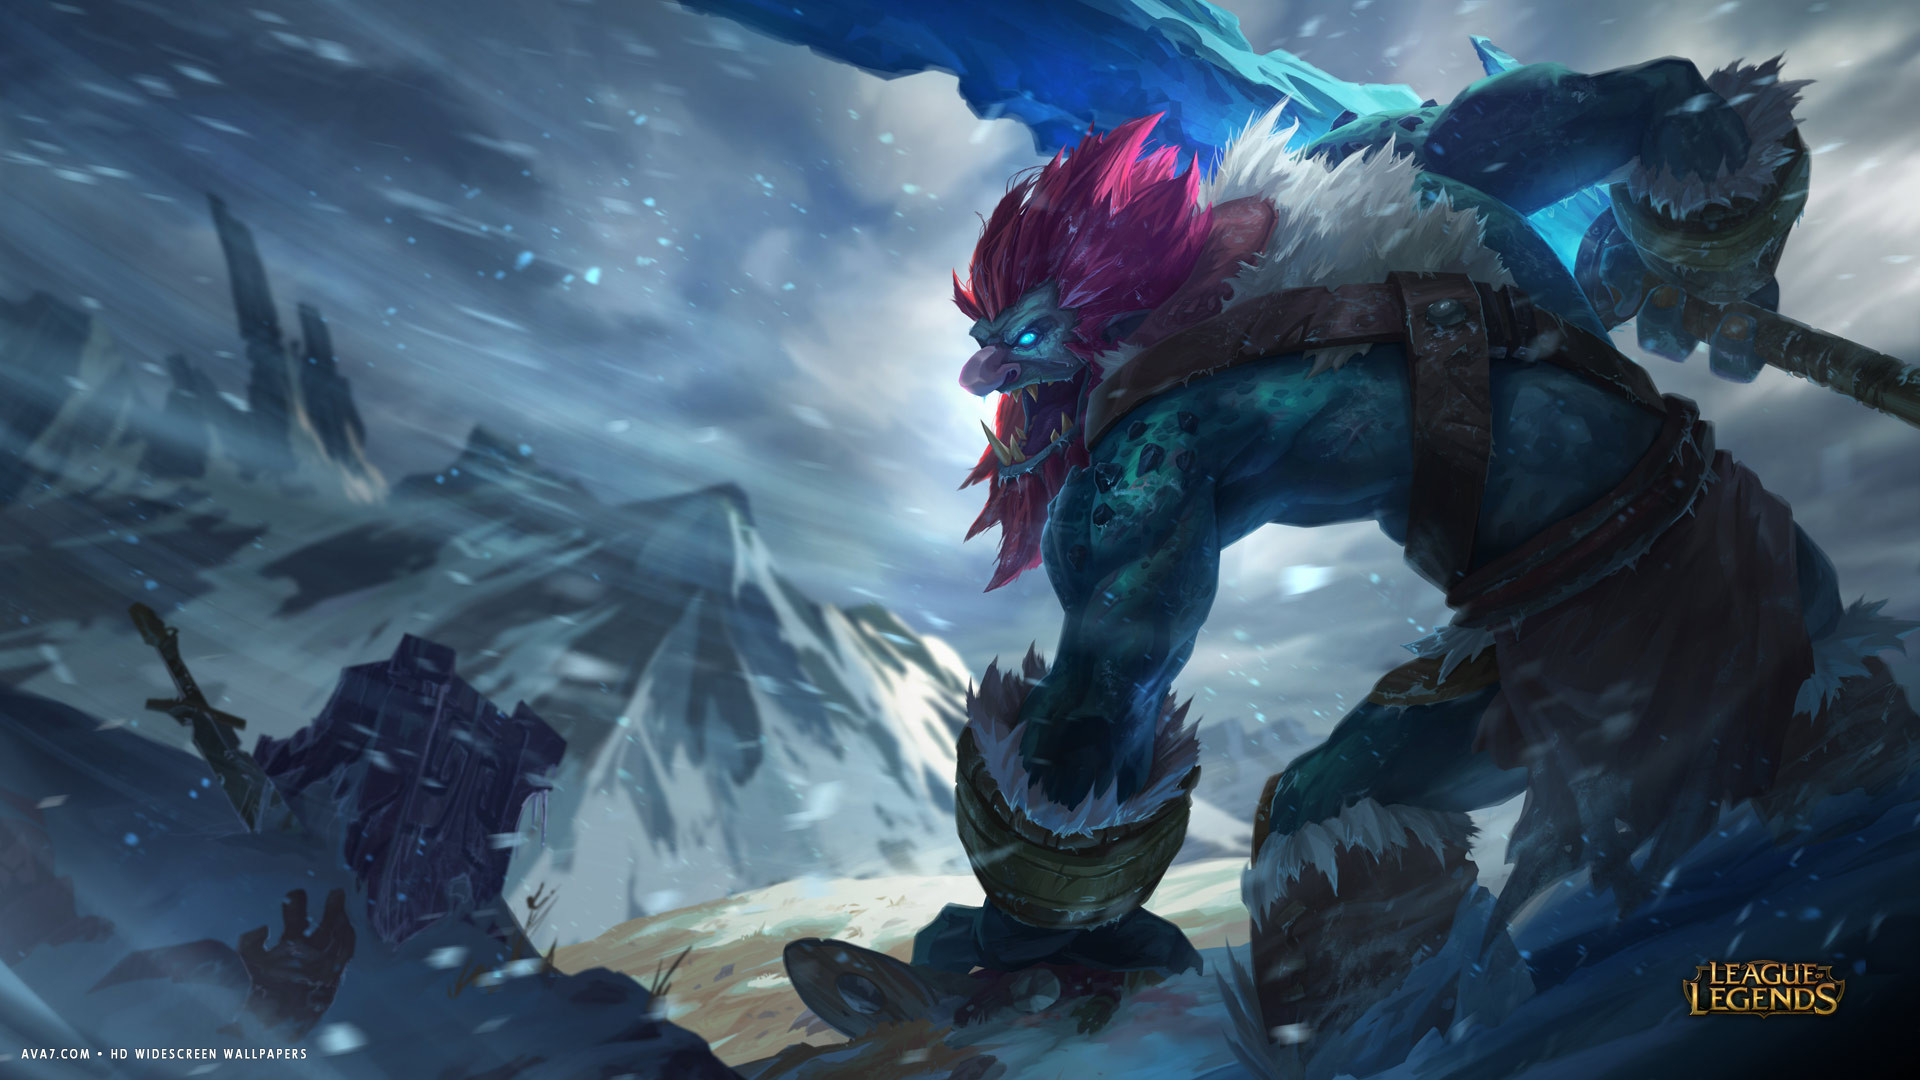 league of legends game lol trundle monster battle hd widescreen wallpaper